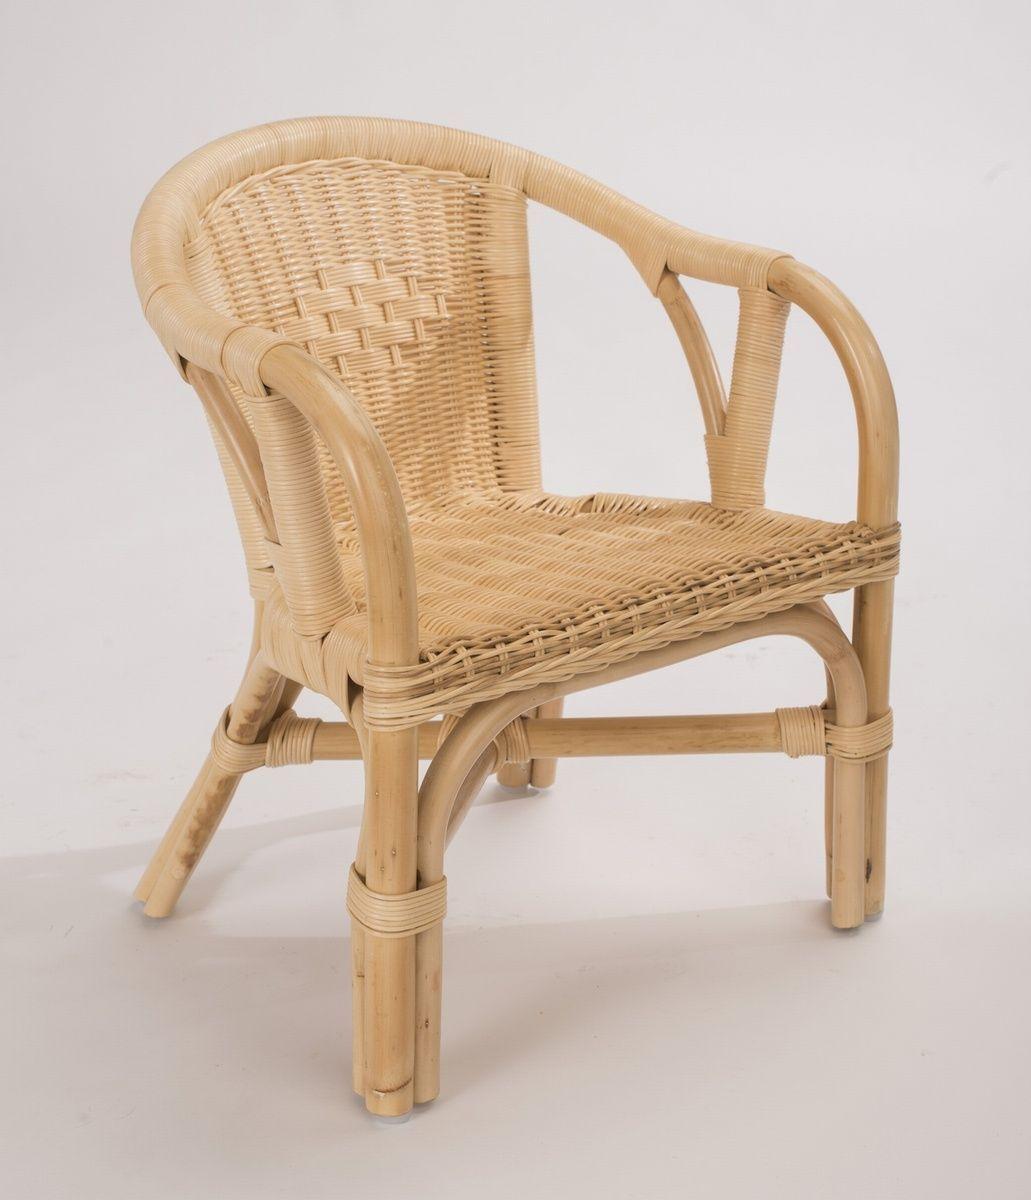 chaise rotin eddy naturel vernis satin mobilier decotaimefr - Chaise En Rotin